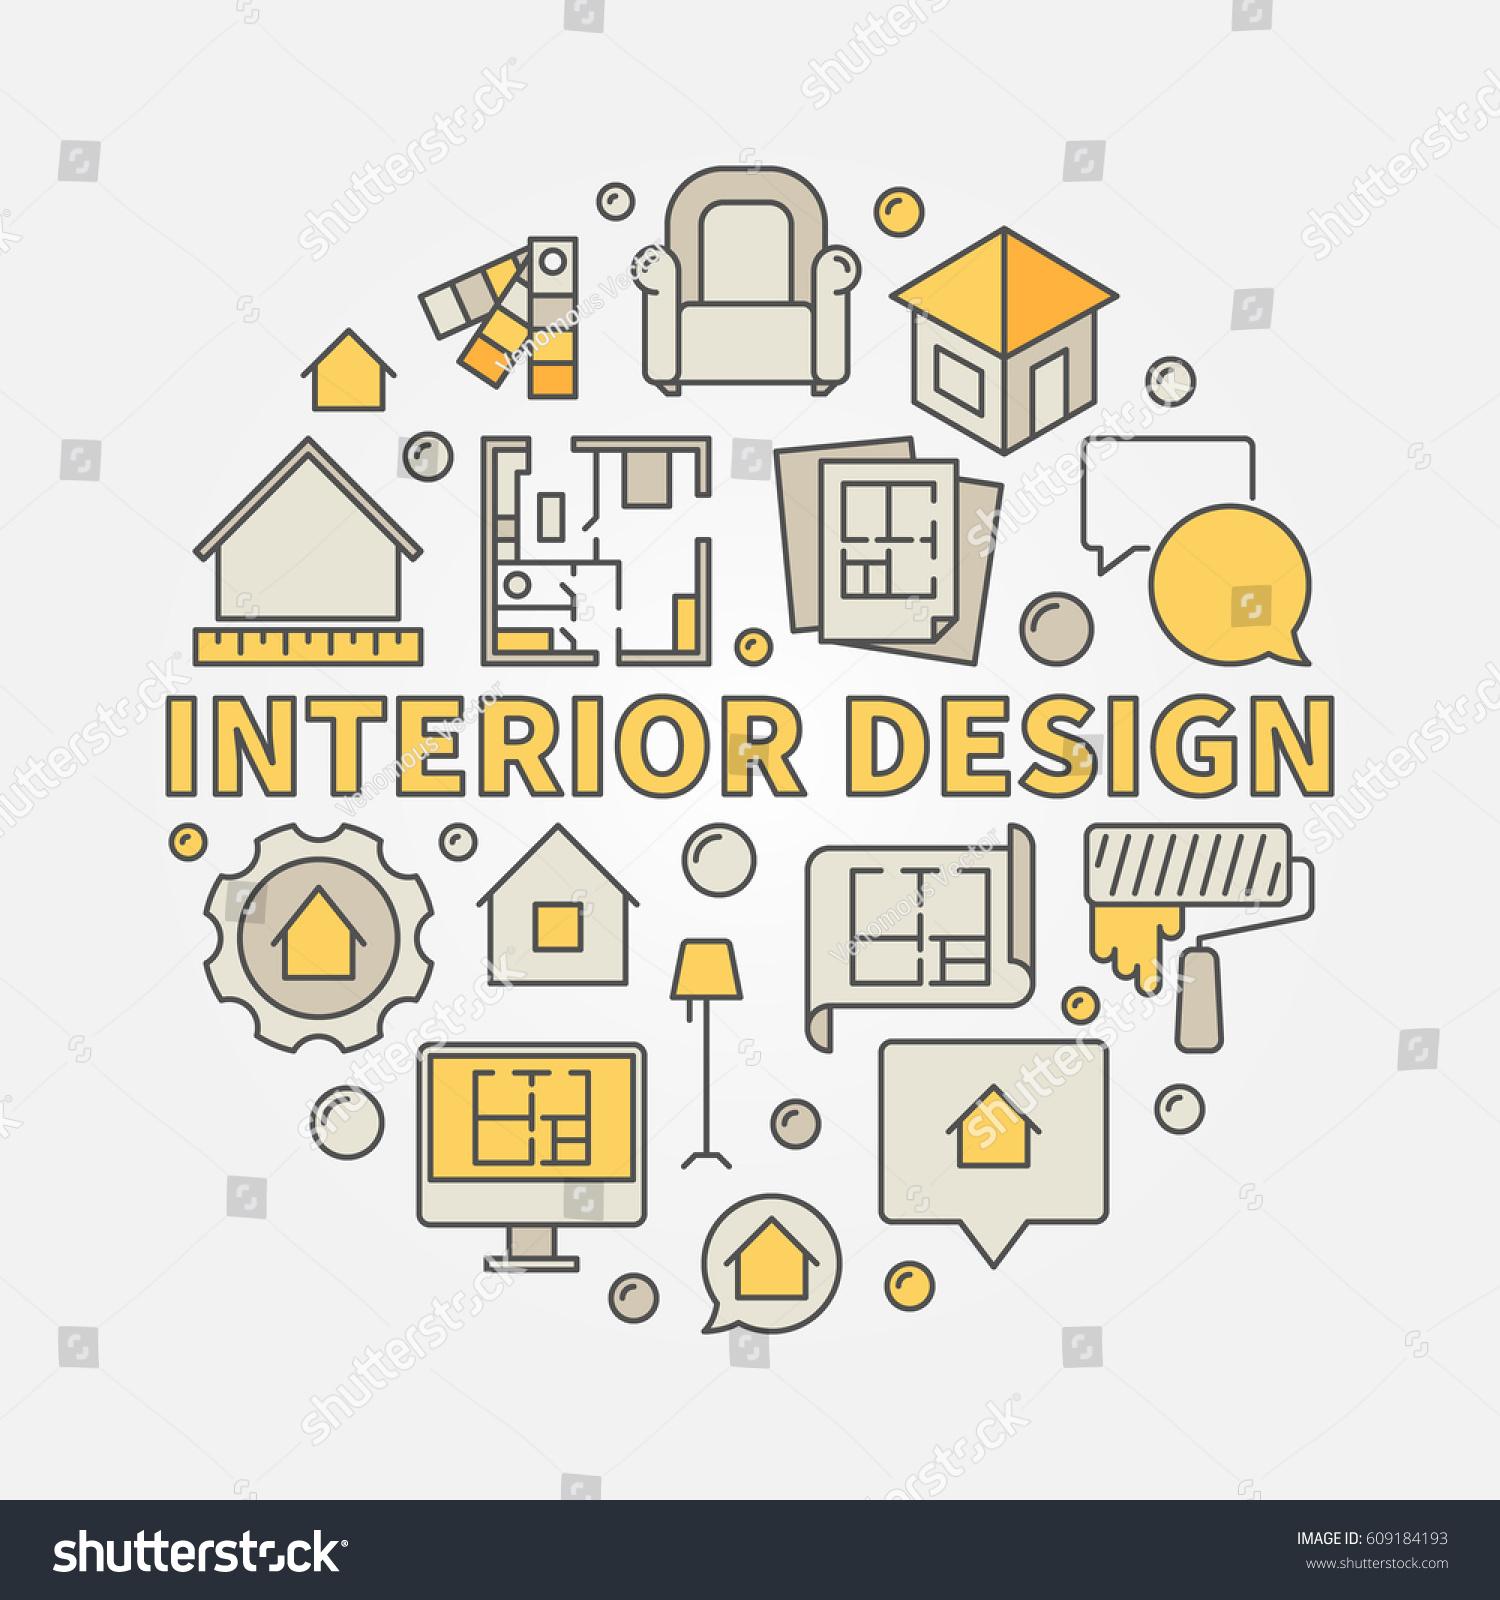 Interior Design Colorful Illustration Vector Circular